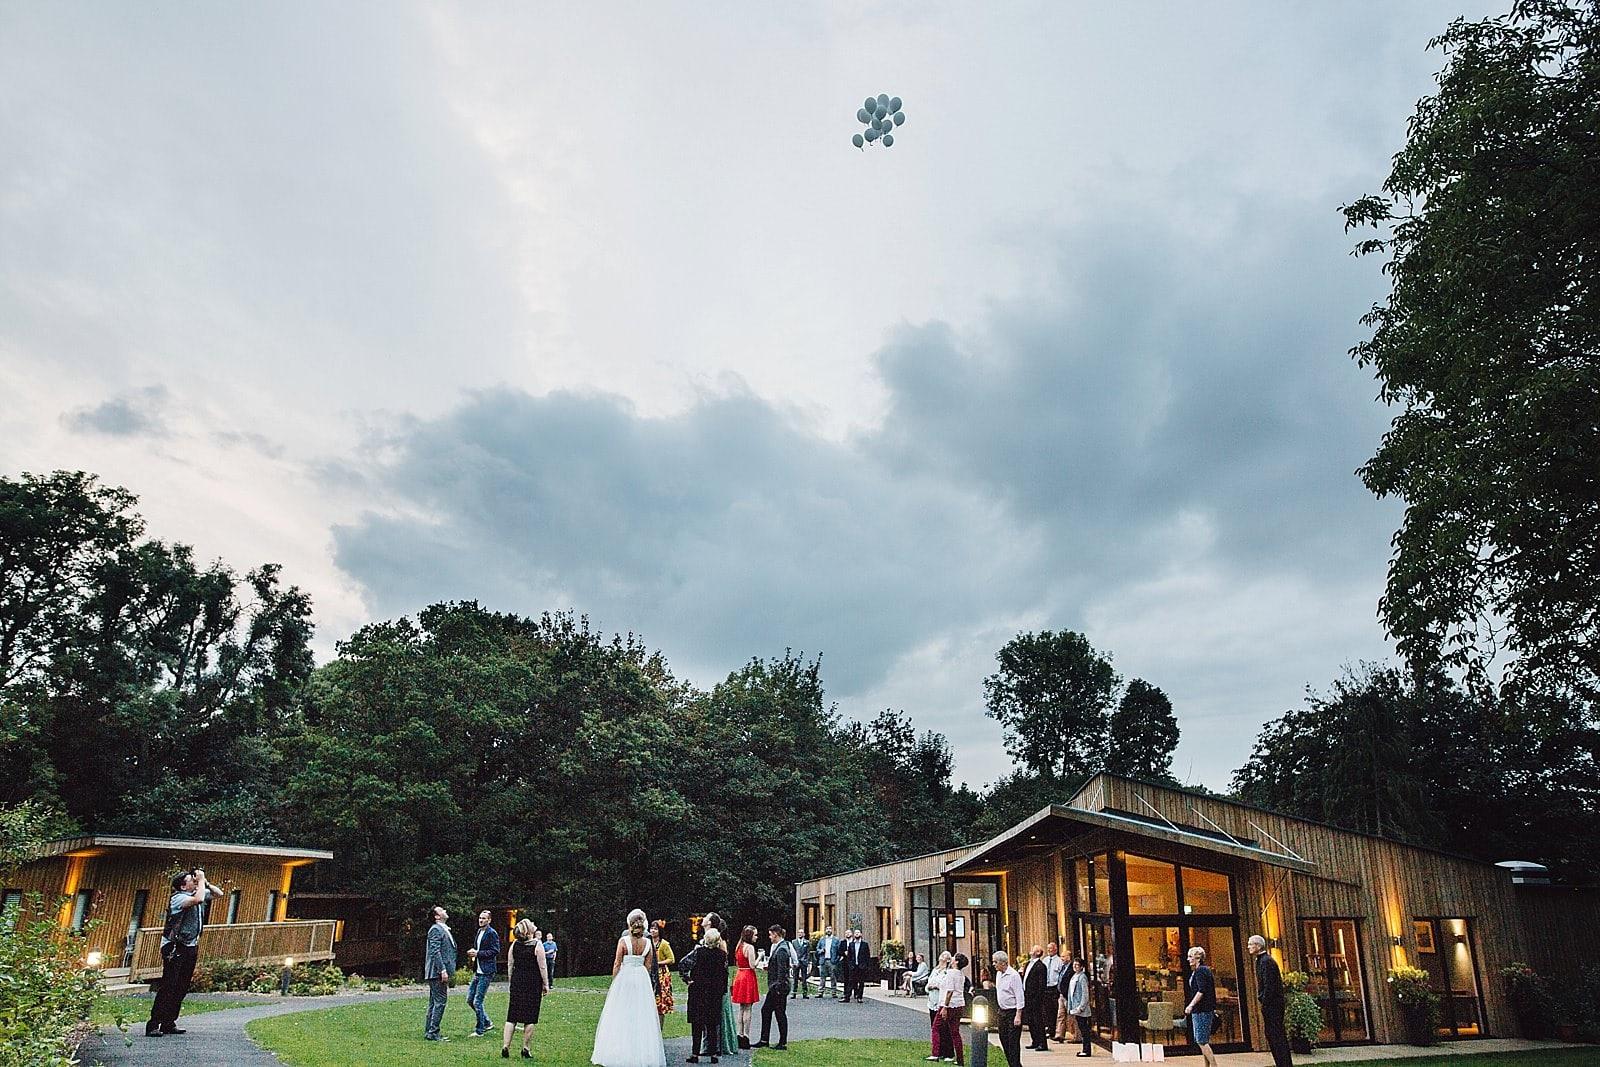 hothorpe-hall-woodlands-wedding-photography_0060